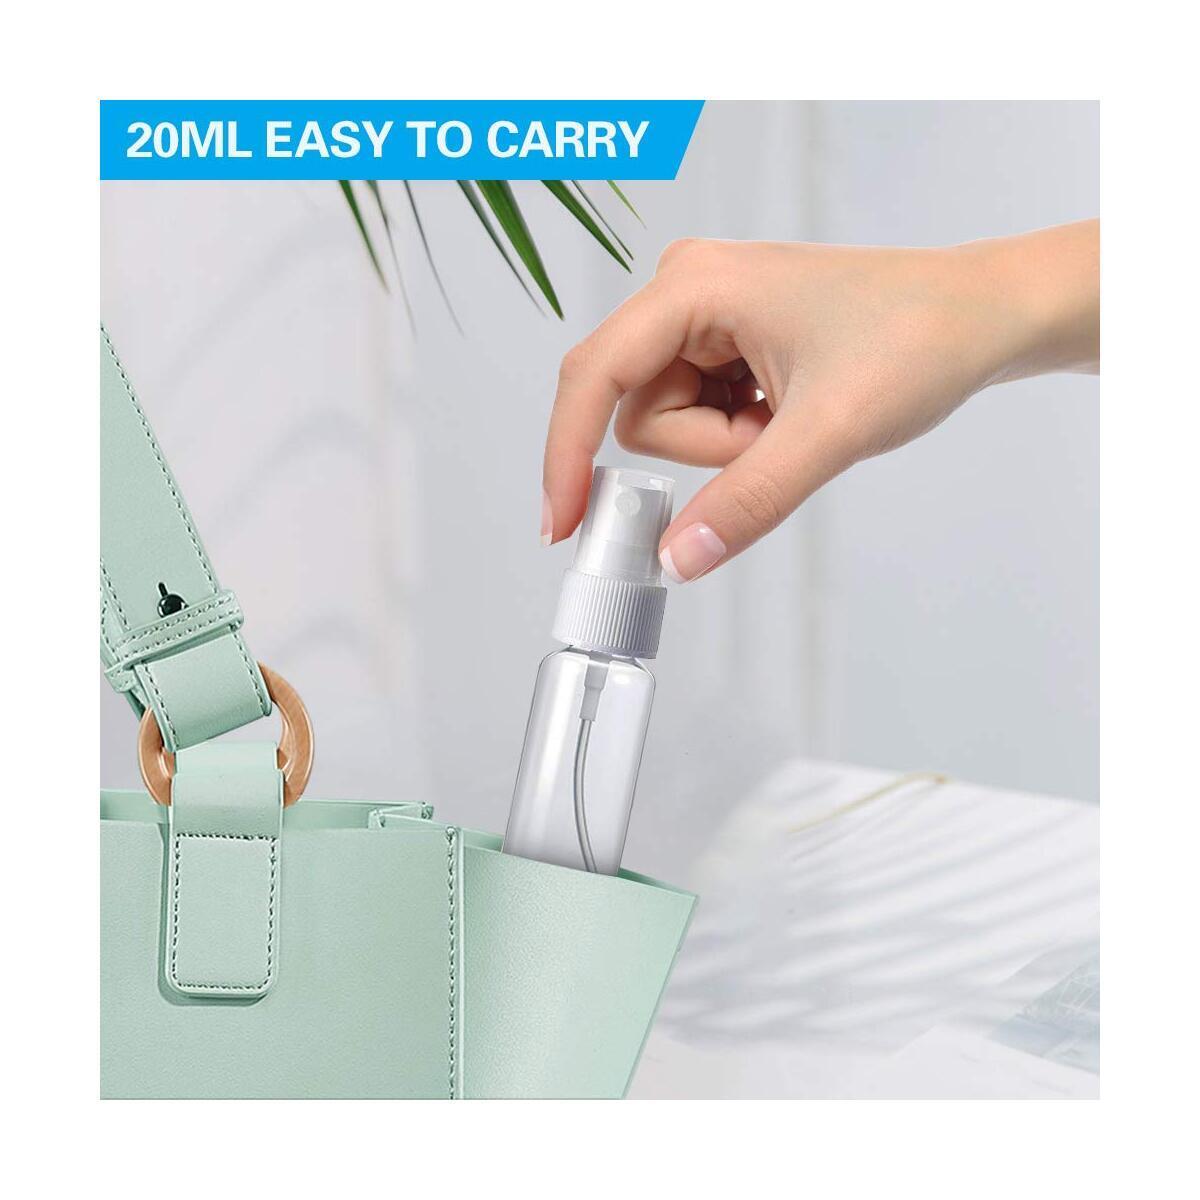 Hair Mist Spray Bottle, YIWGOOD 32oz Plastic Refillable Empty Trigger Sprayer for Hair Salons, Cleaning, Pets, Plants or Air Freshener & 2 Pack 20ml Small Spray Bottles for Hand Sanitizer